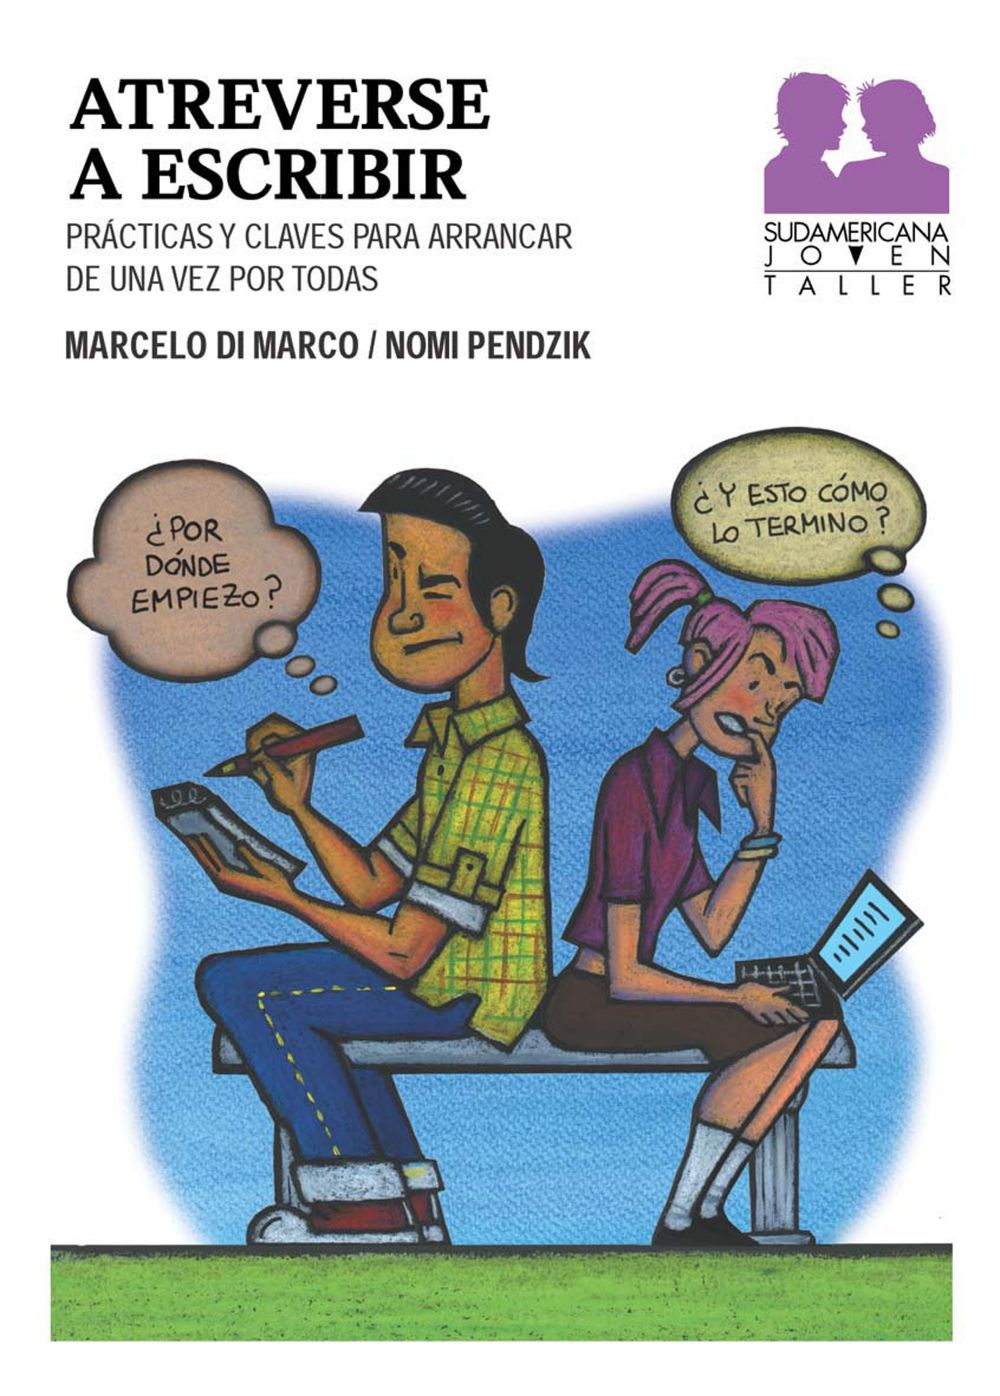 Centroamerica: Guatemala: Libros: Librerias Artemis Edinter ...